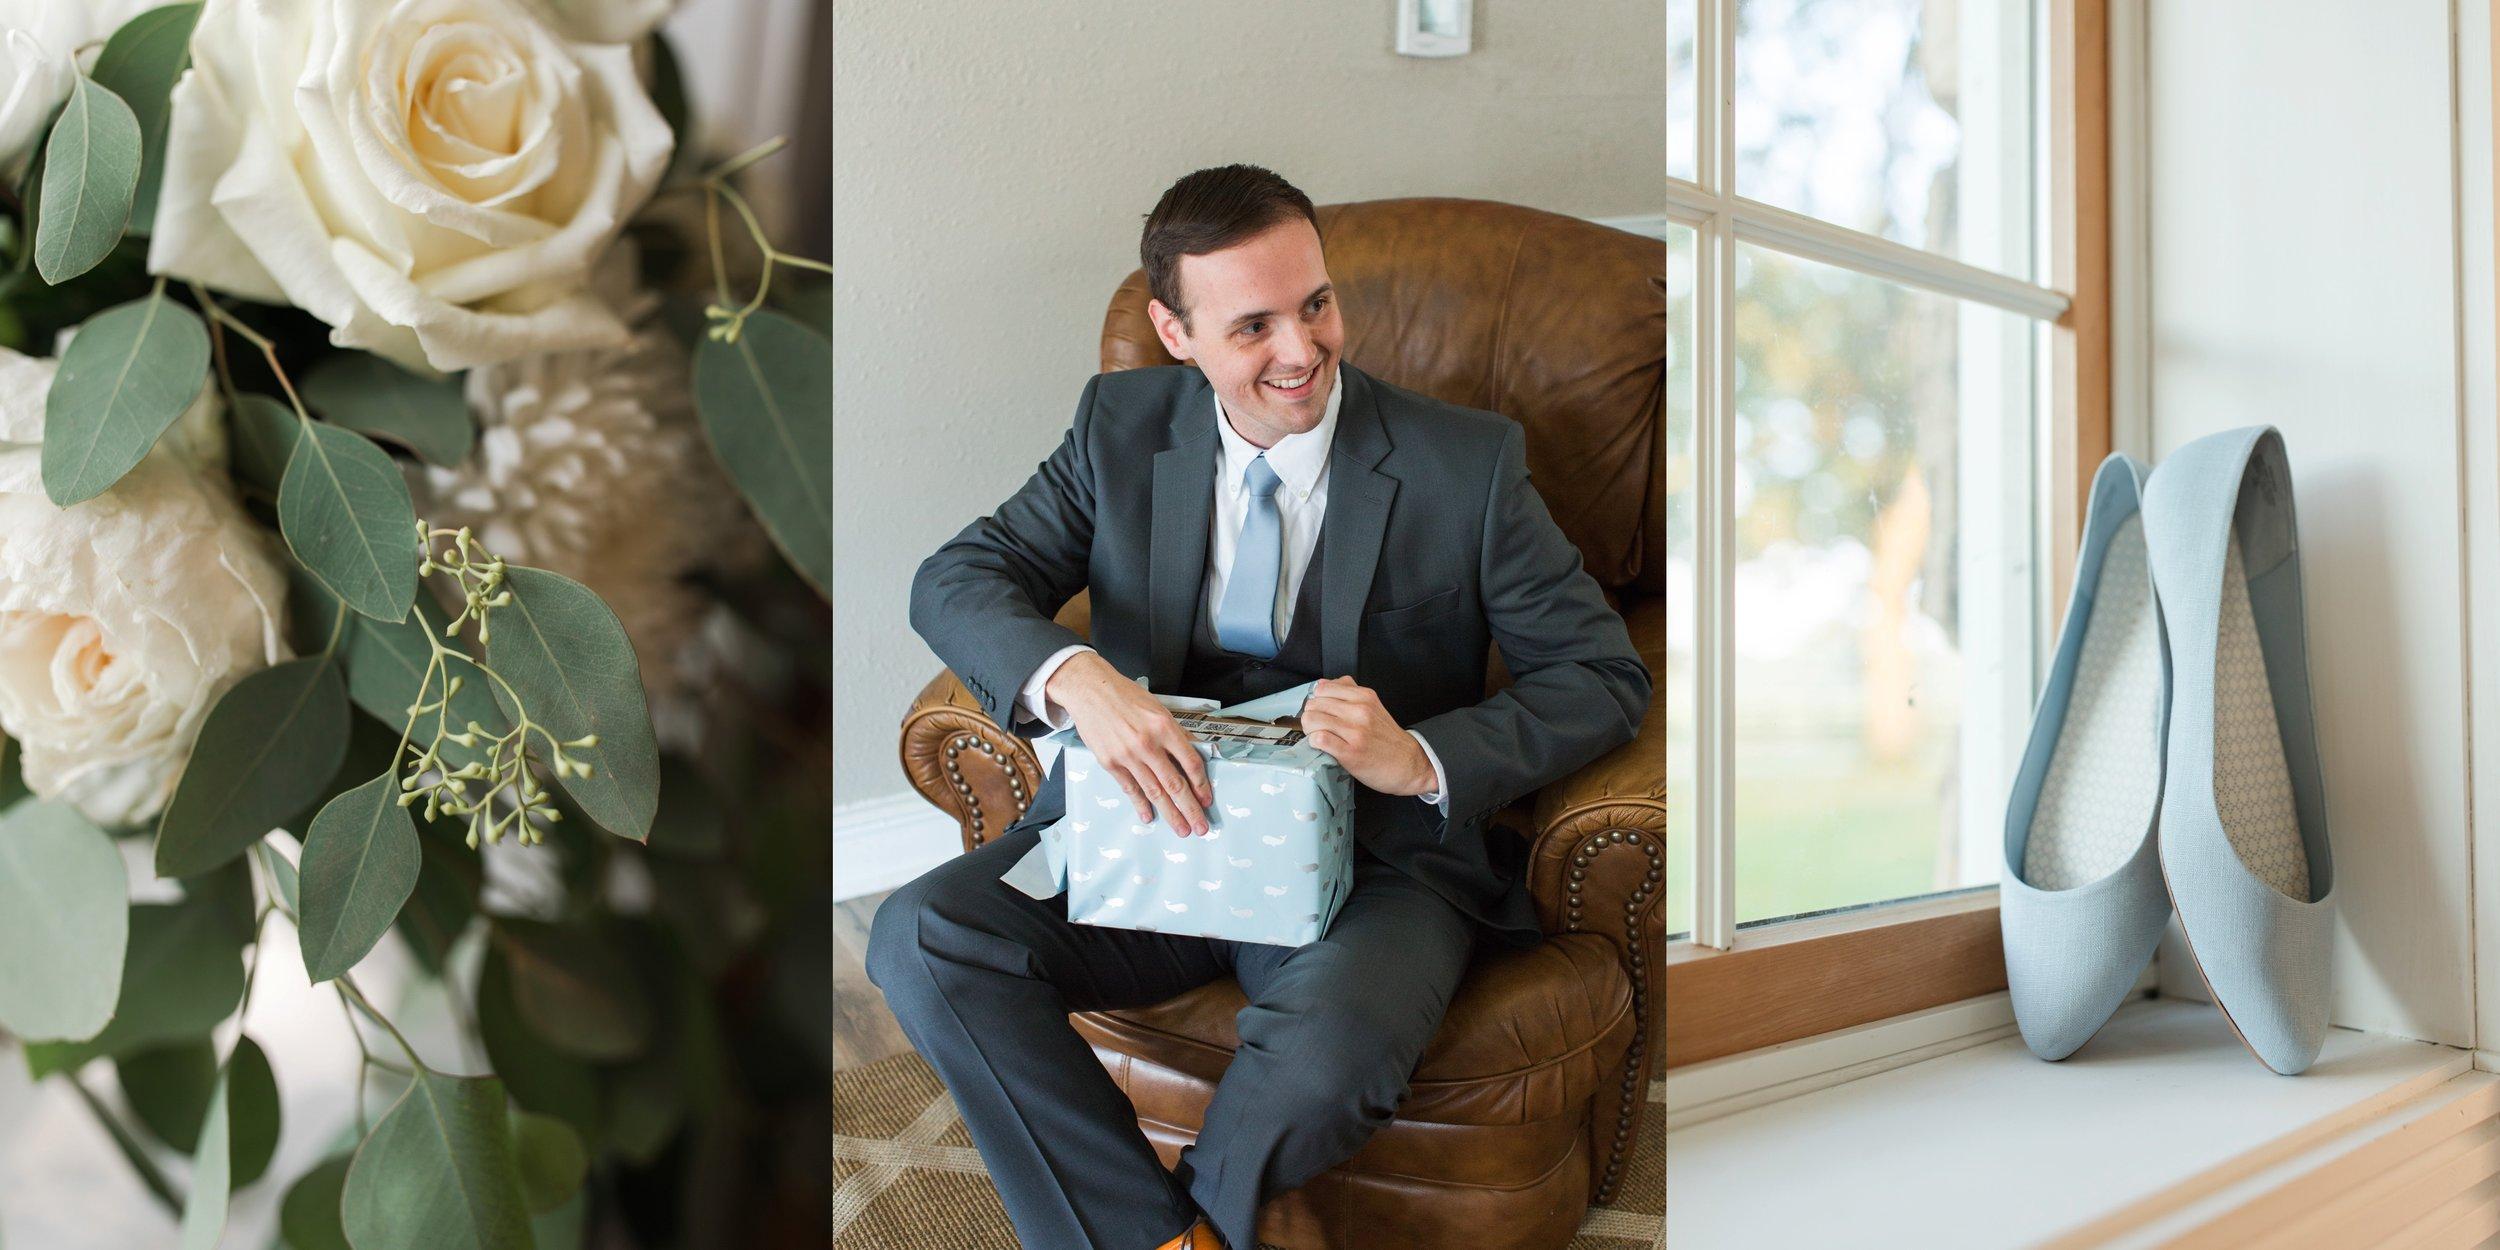 Guys-Getting-Ready-Missouri-Bride-KomorebiPhotography